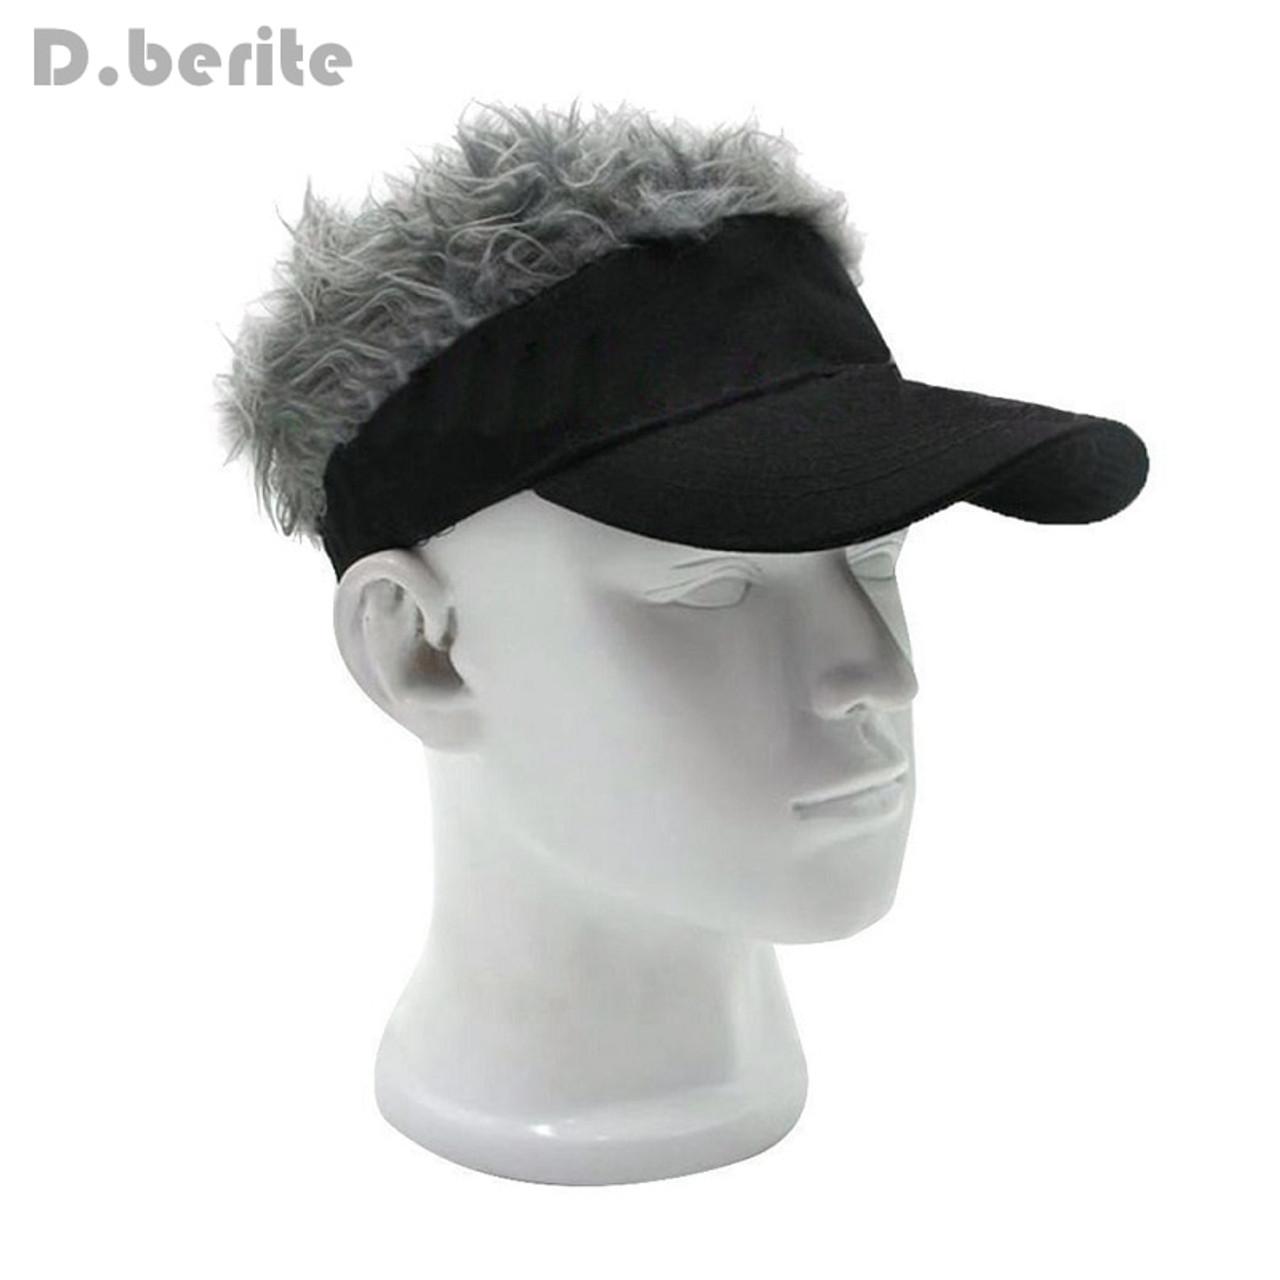 ... Funny Men Adjustable Wig Cap Unisex Flair Hair Visor Snapback Casquette  Hat Casual Golf Caps Outdoor ... 6977160f7f4